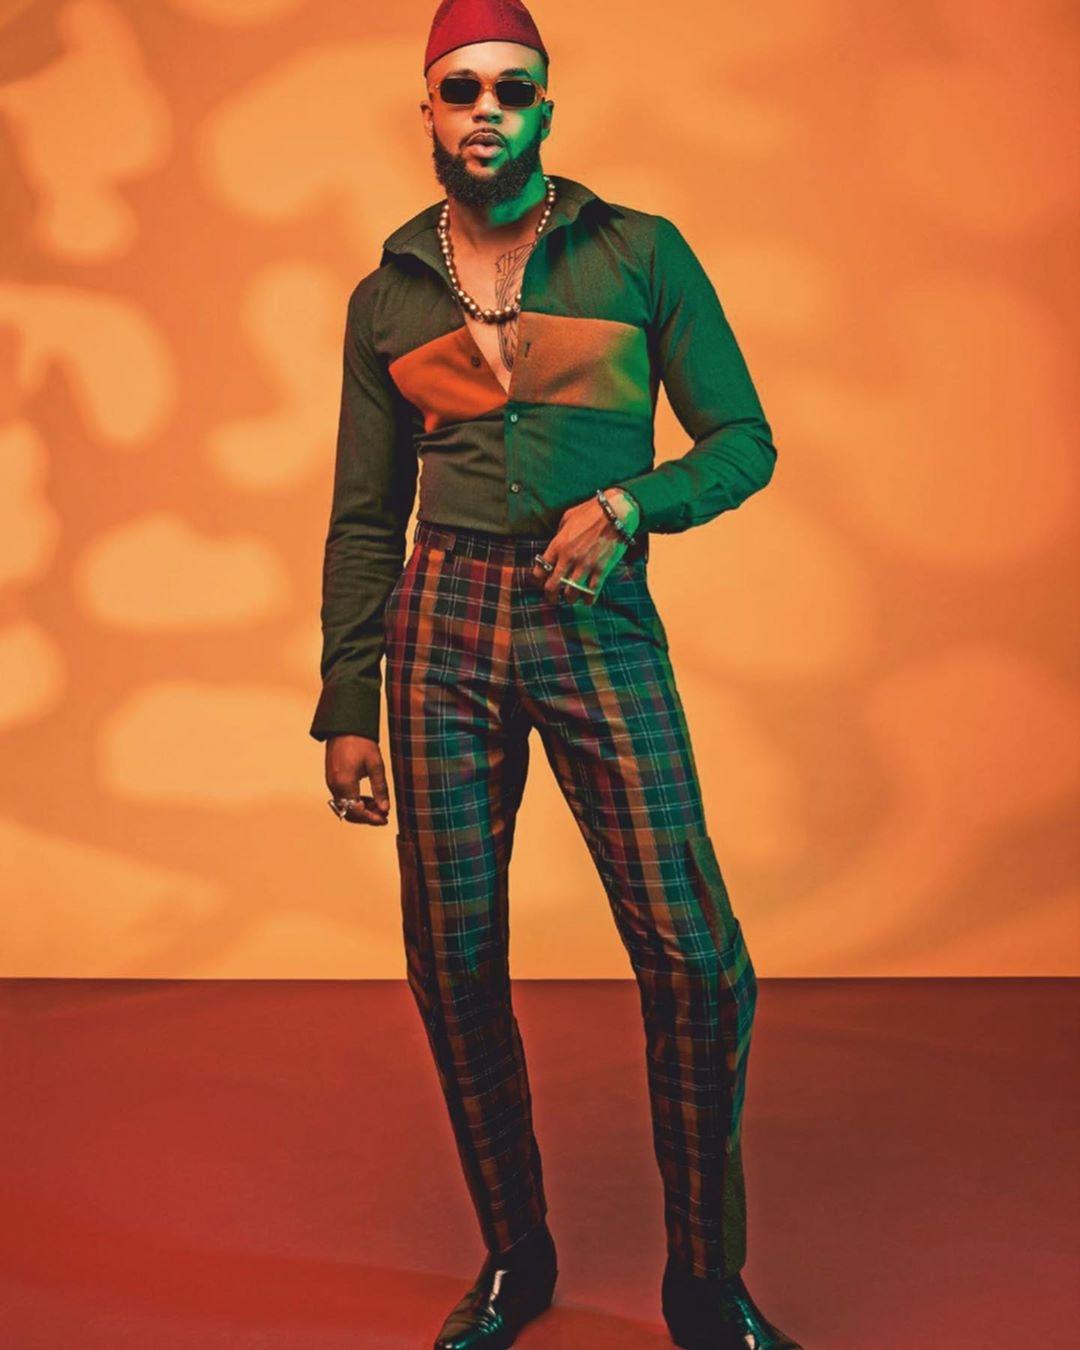 black-men-style-african-male-celebrities-jidenna-gq